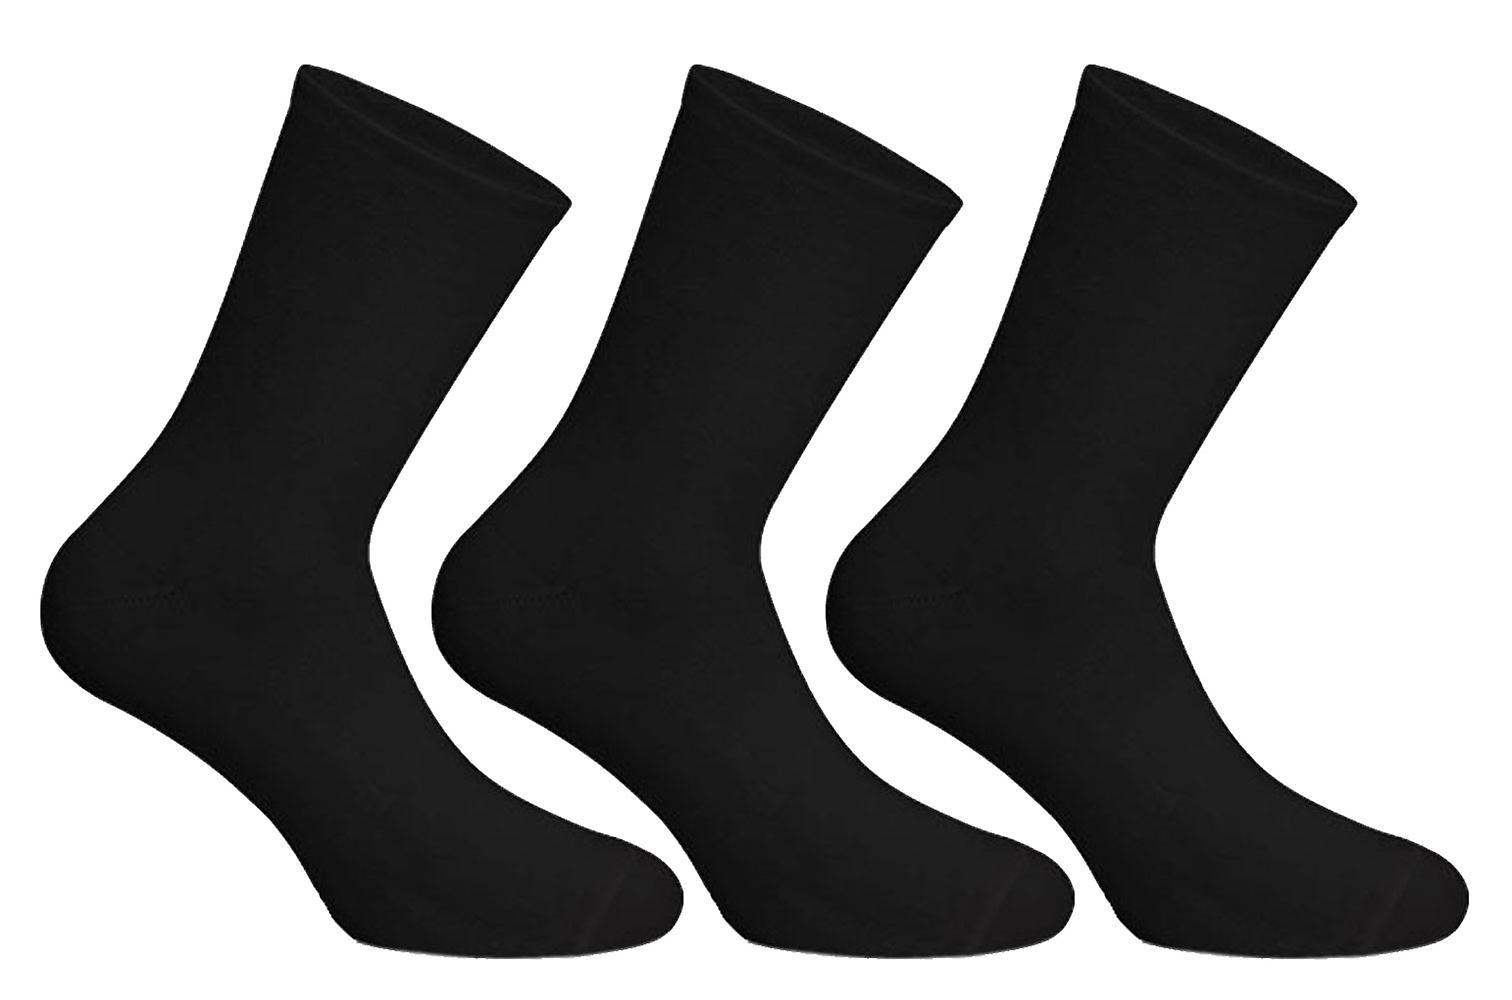 Chaussettes Uwear Mens Cotton Rich Smooth Plain Short Socks (Pack of 12)